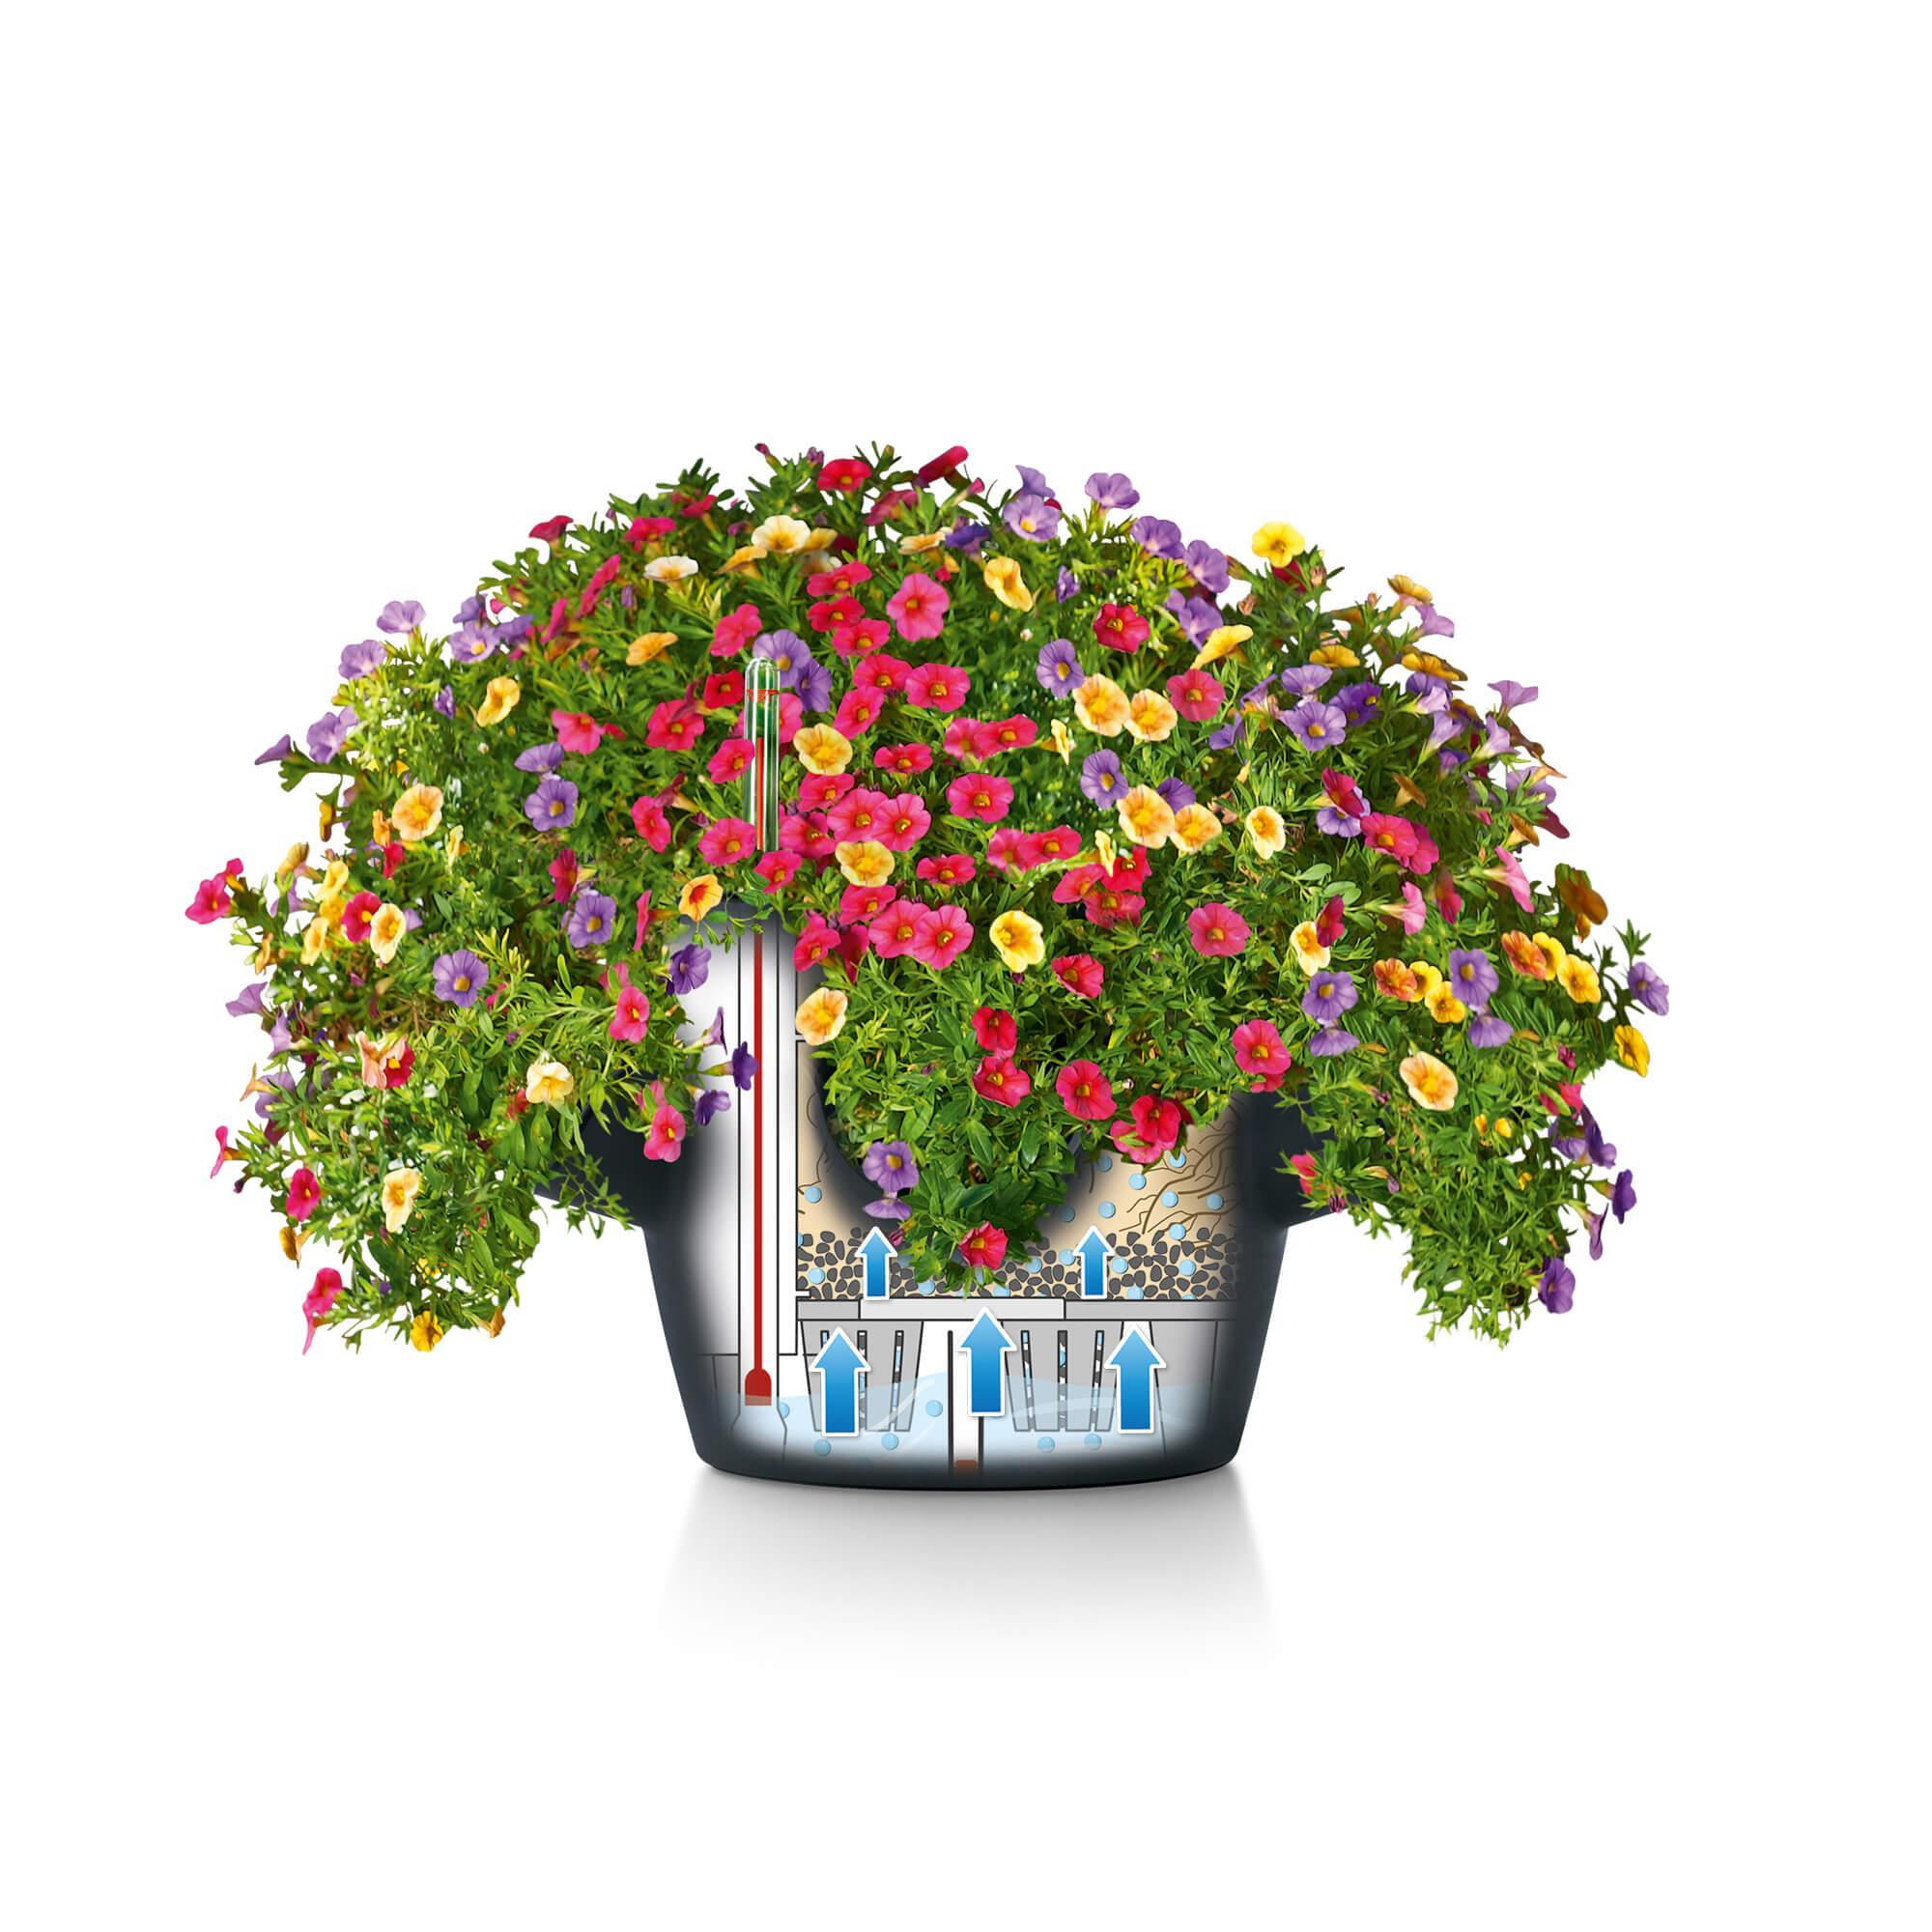 CASCADINO Color Single hanging planter slate - Image 7